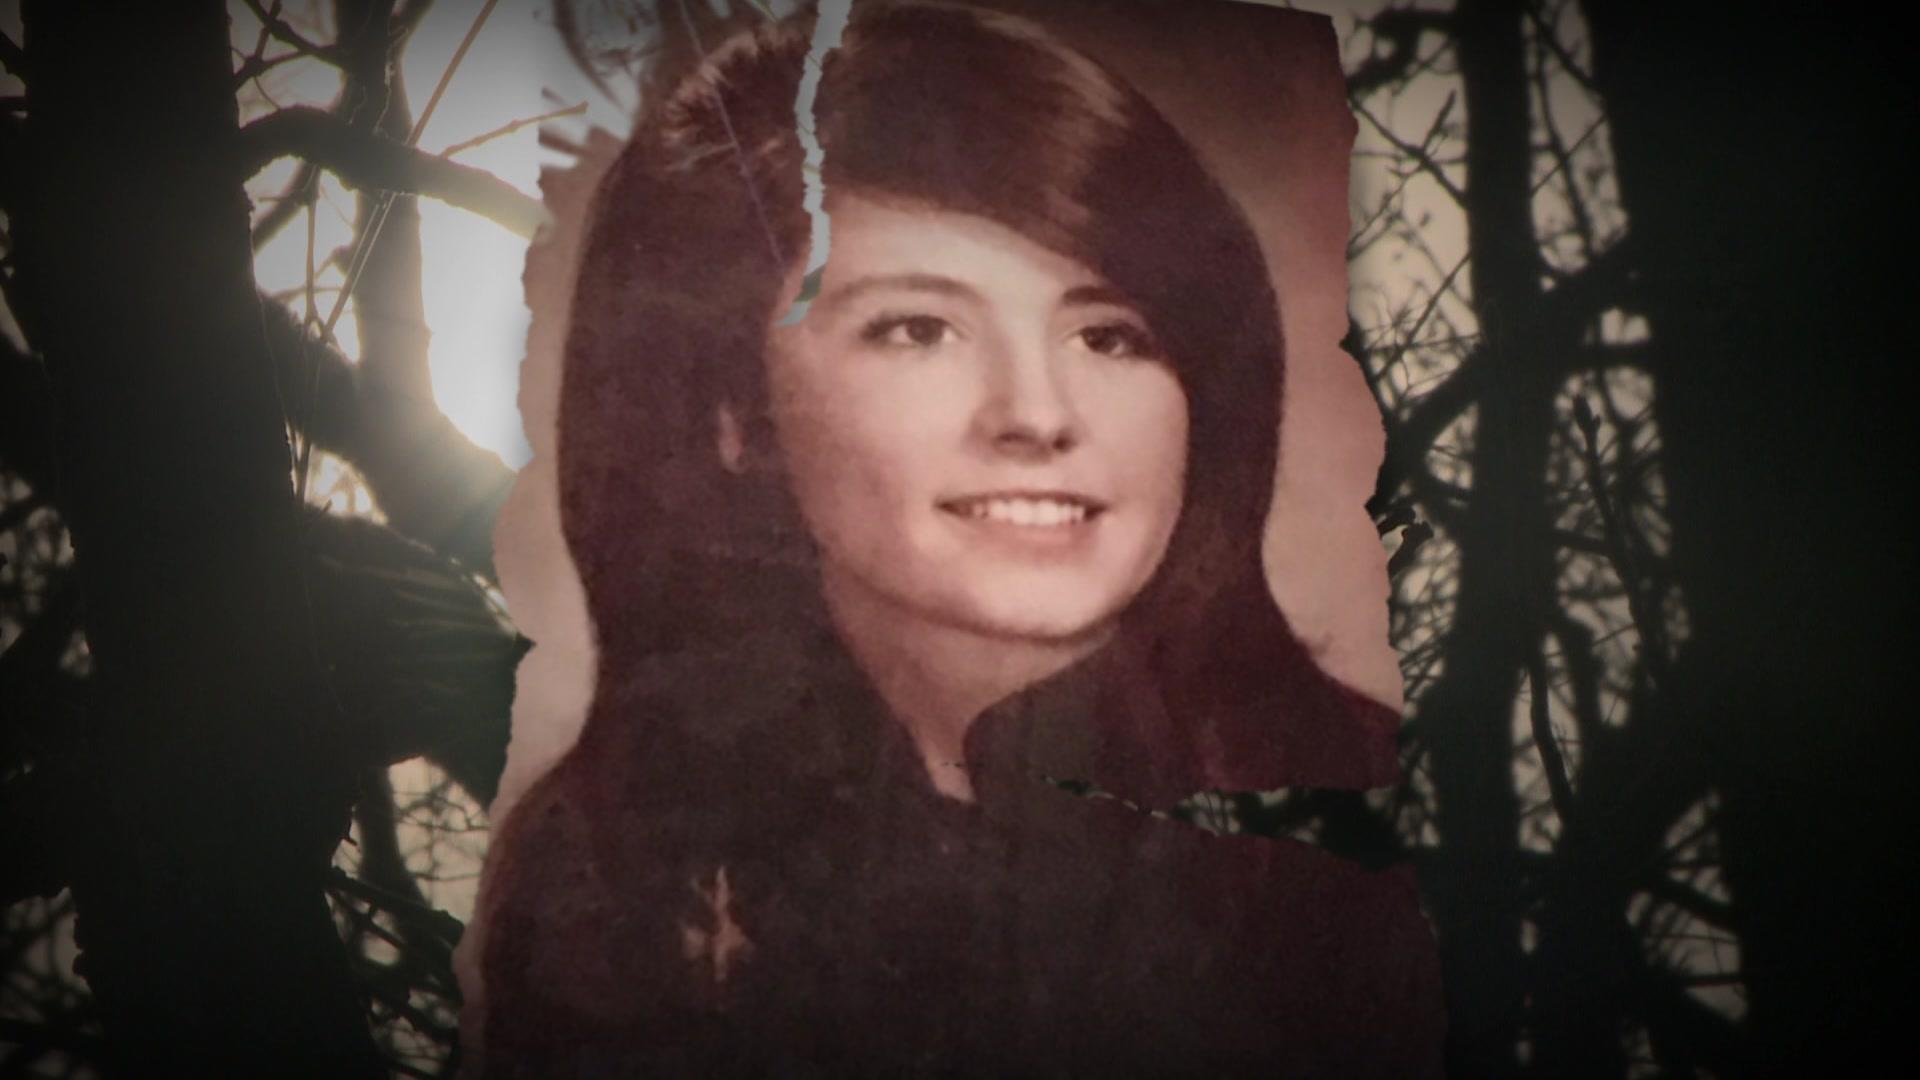 Gruesome cold case murder of Milwaukee teen Stephanie